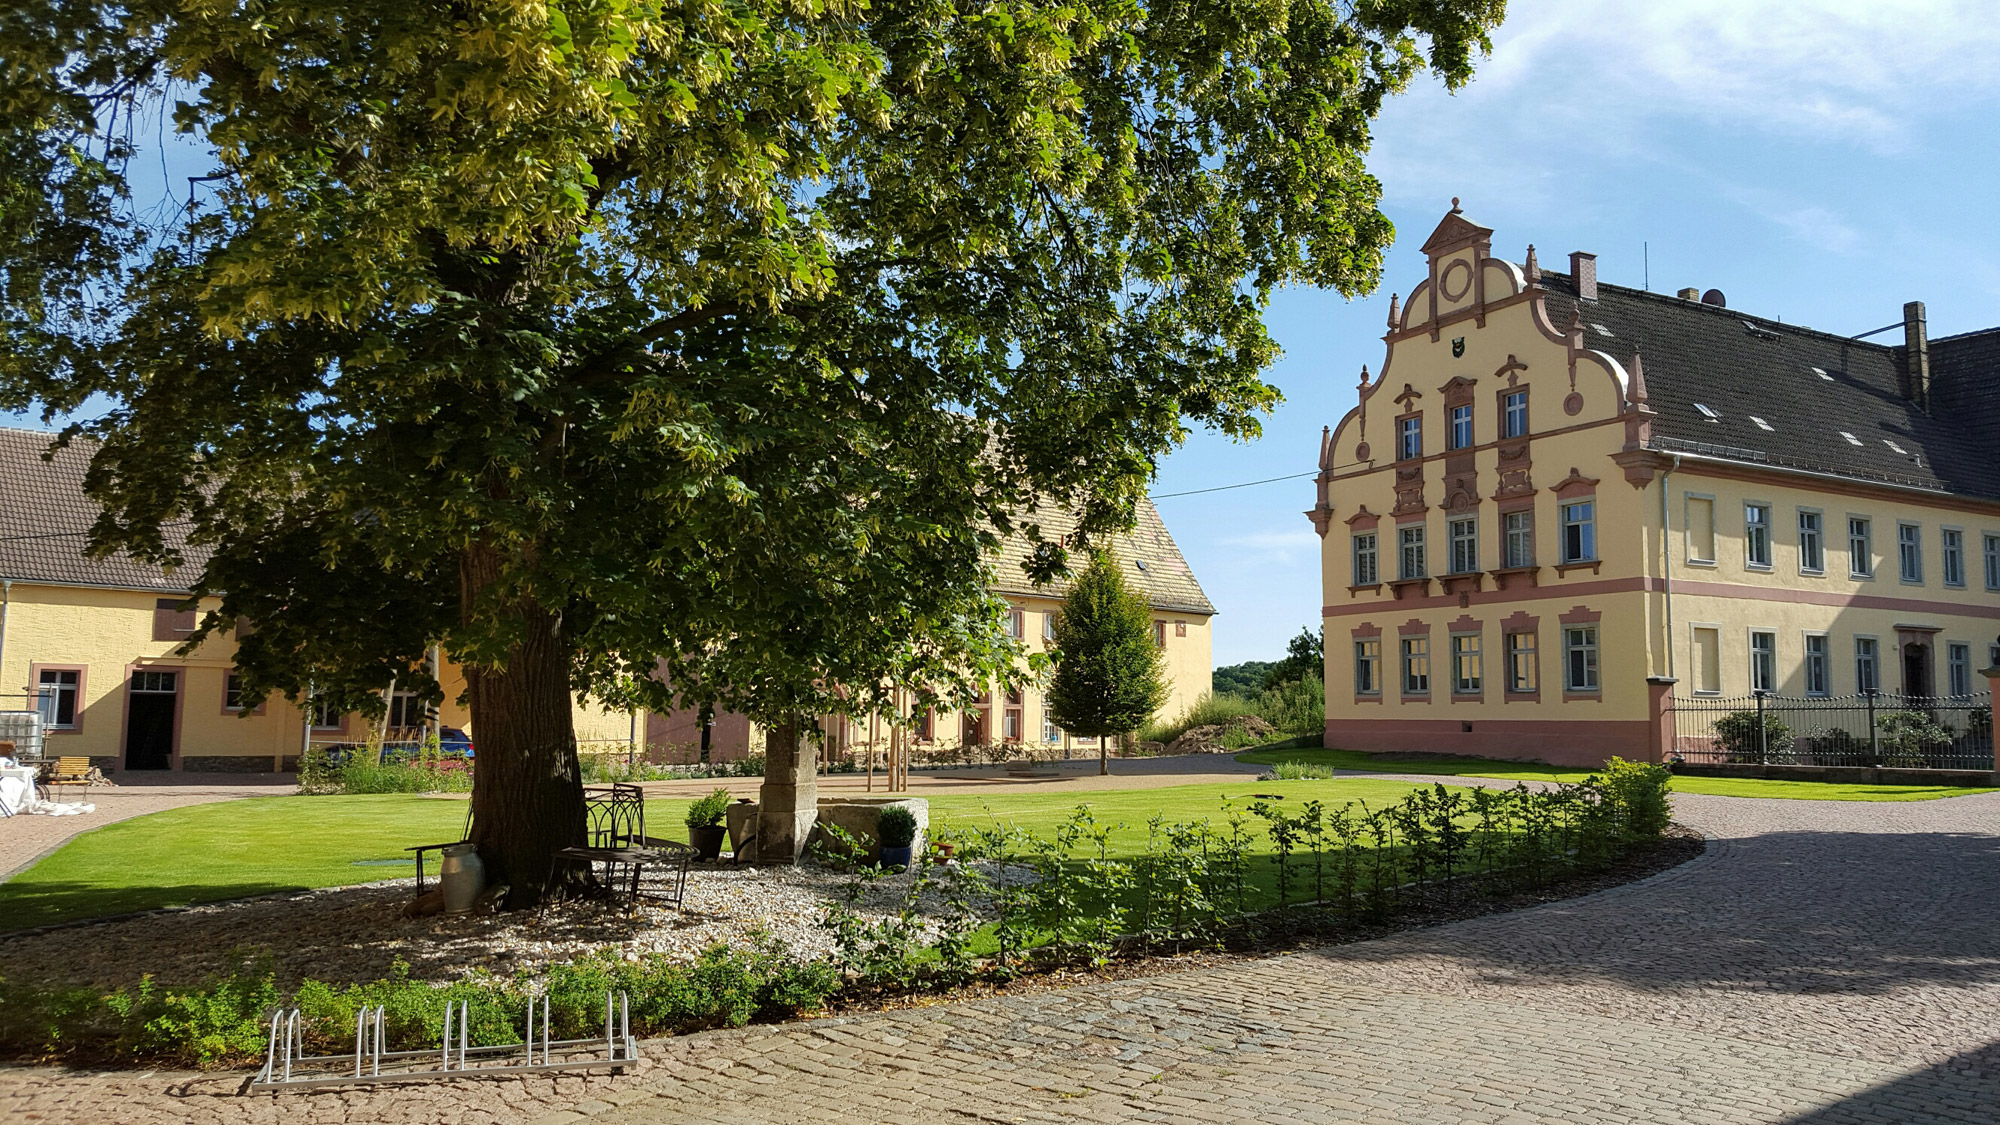 De mooiste steden in Saksen - Grimma